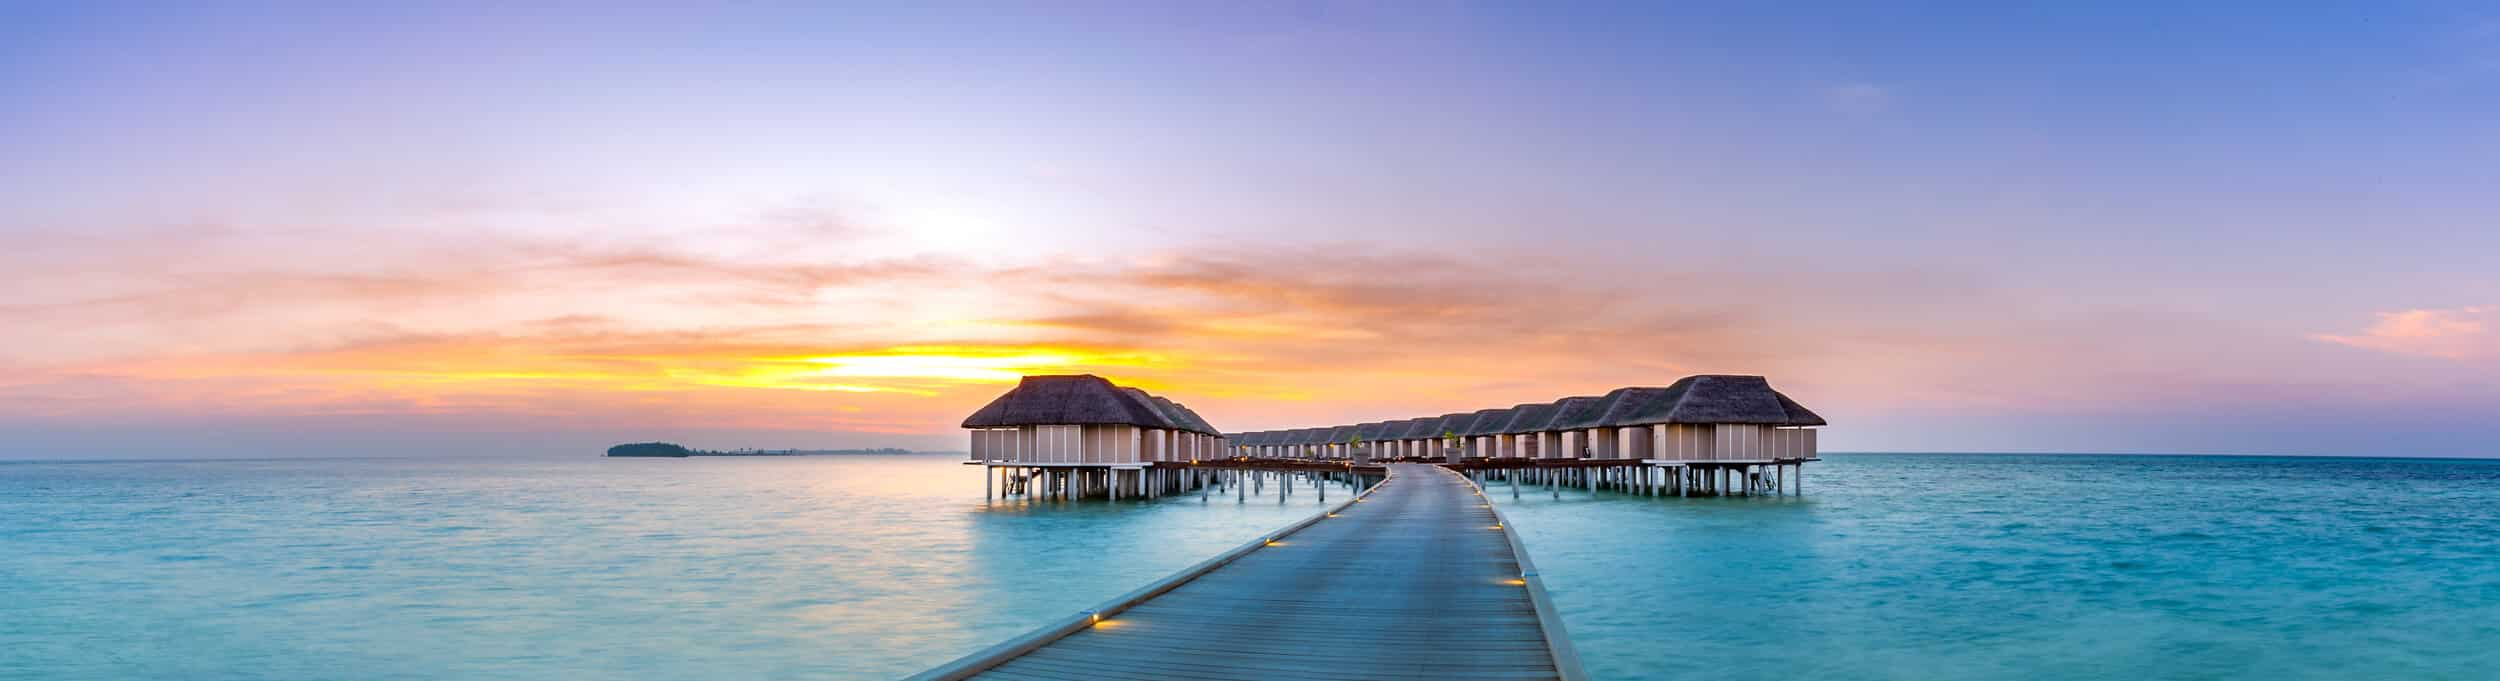 ocean huts in paradise